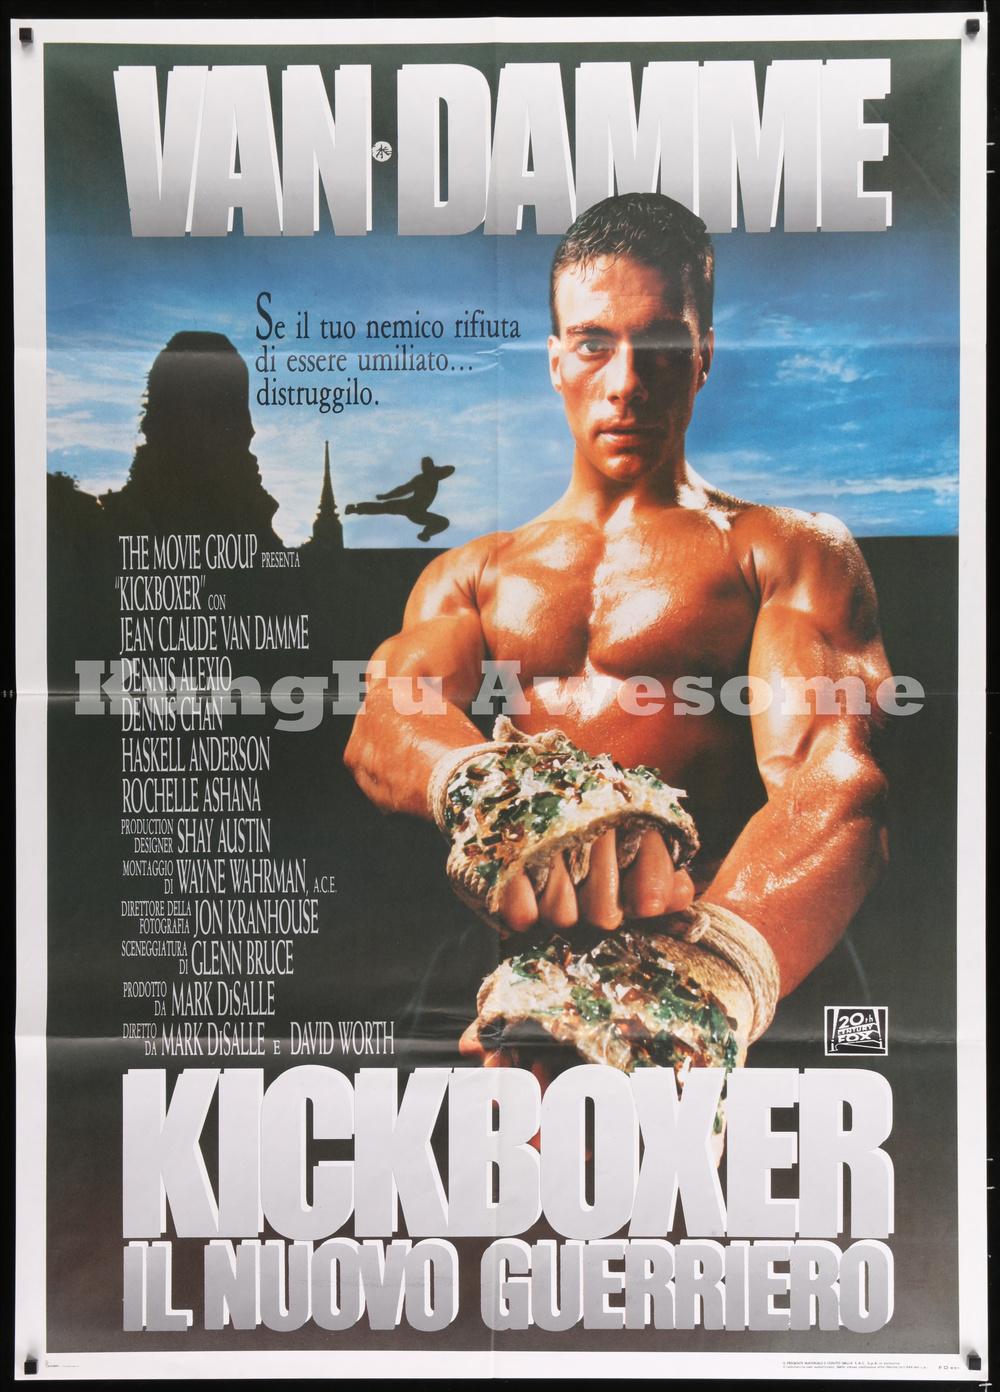 italian_1p_kickboxer_BM02196_C.jpg